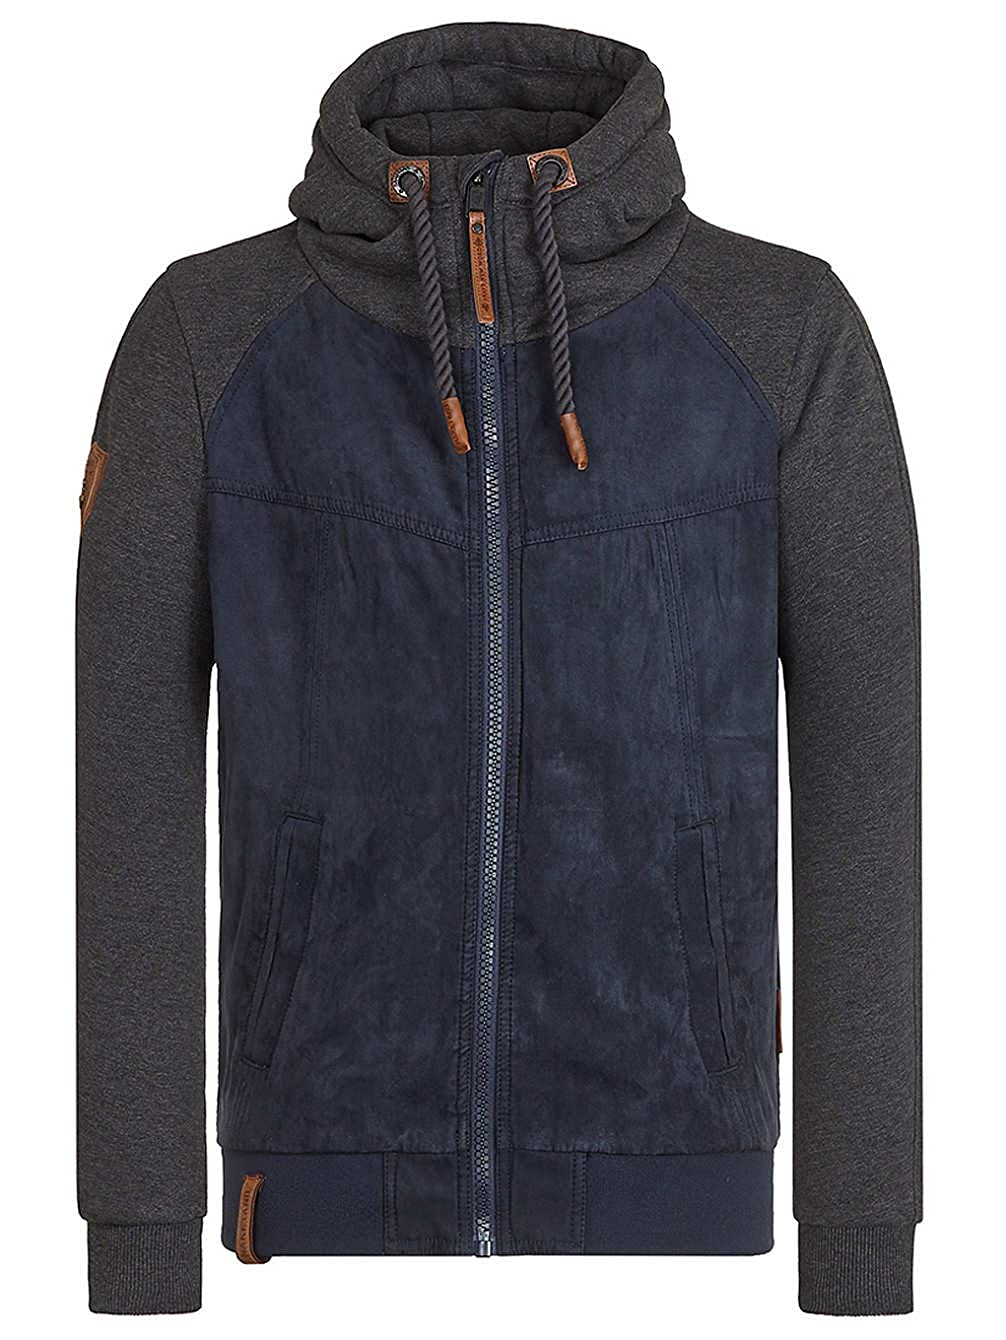 Naketano Men's Jacket Trallafitti Titti II 1700-0515